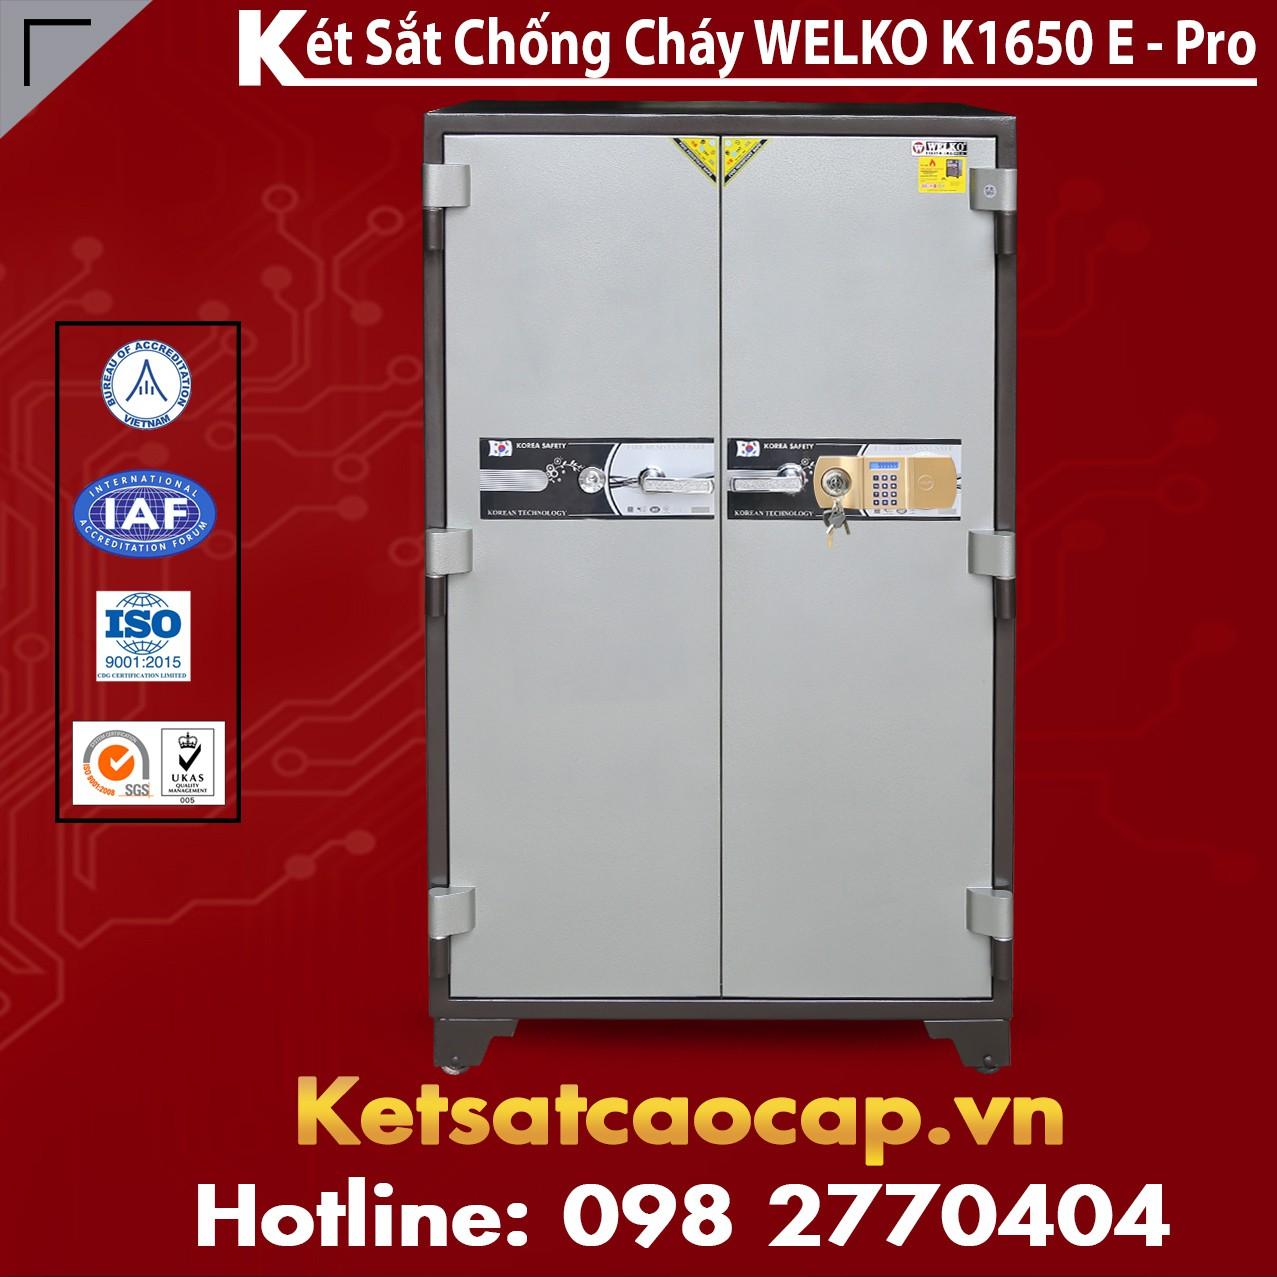 Két Sắt Chống Cháy Welko K1650 E - Pro